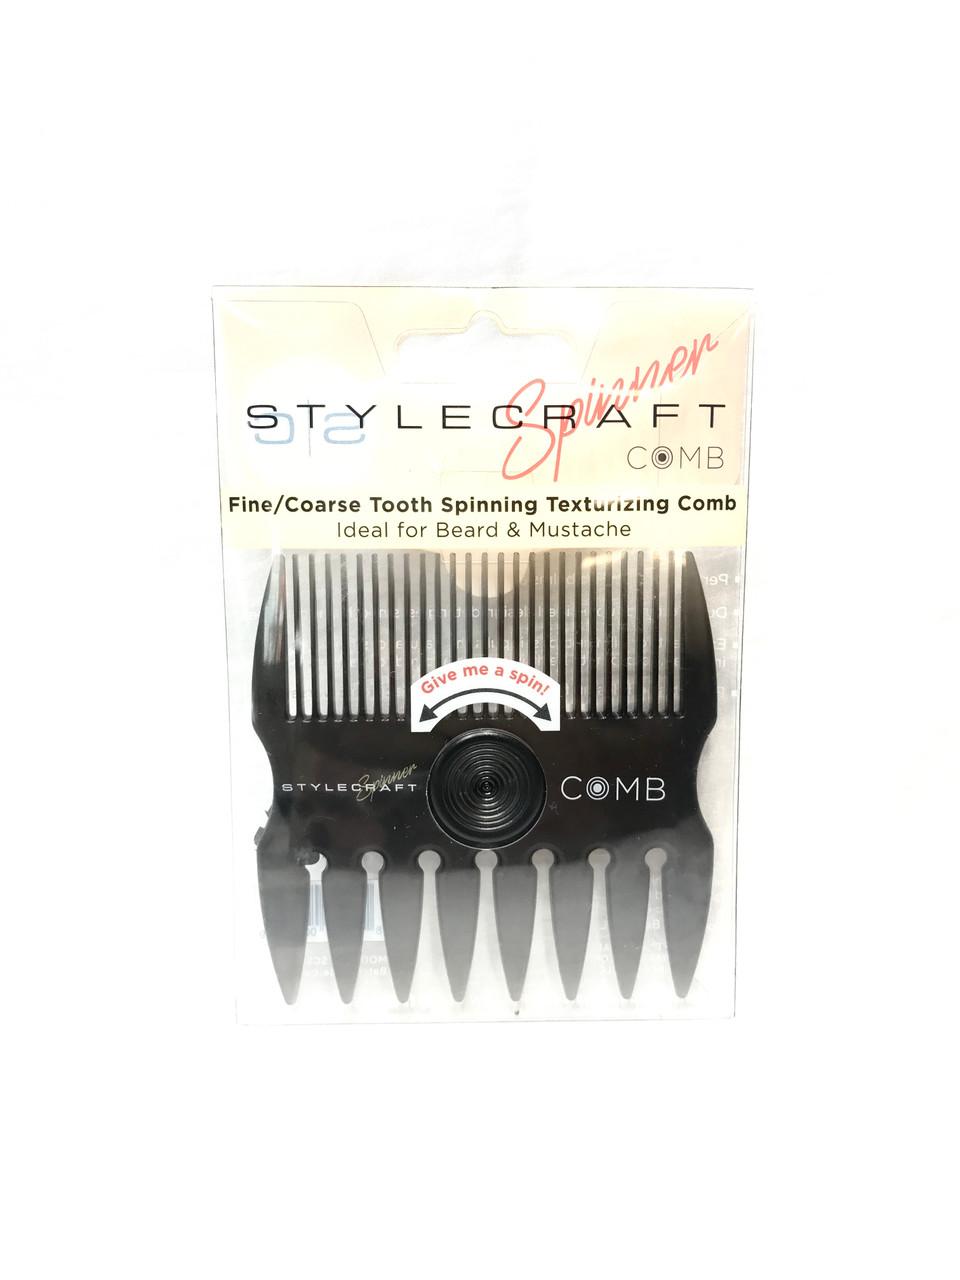 Spinner Comb by Stylecraft